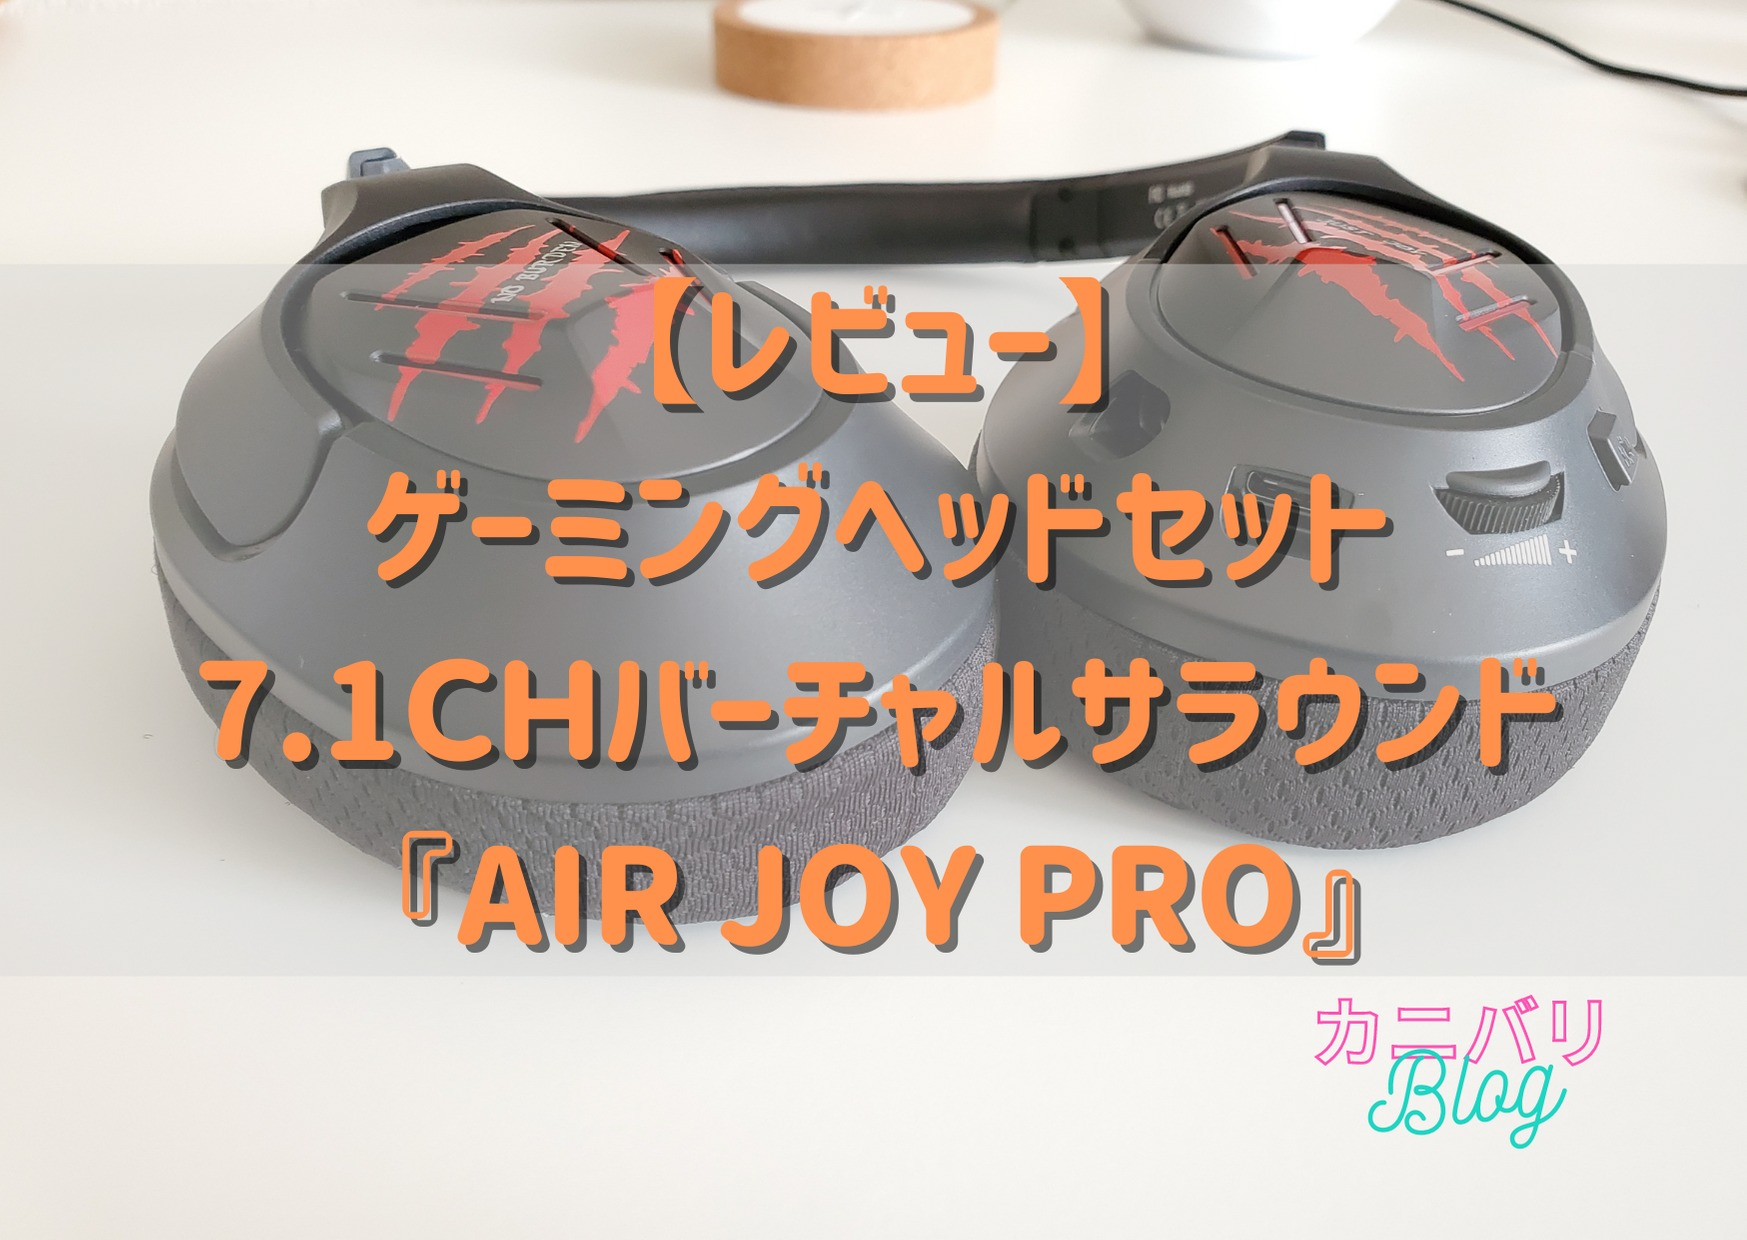 Air Joy Proレビュー